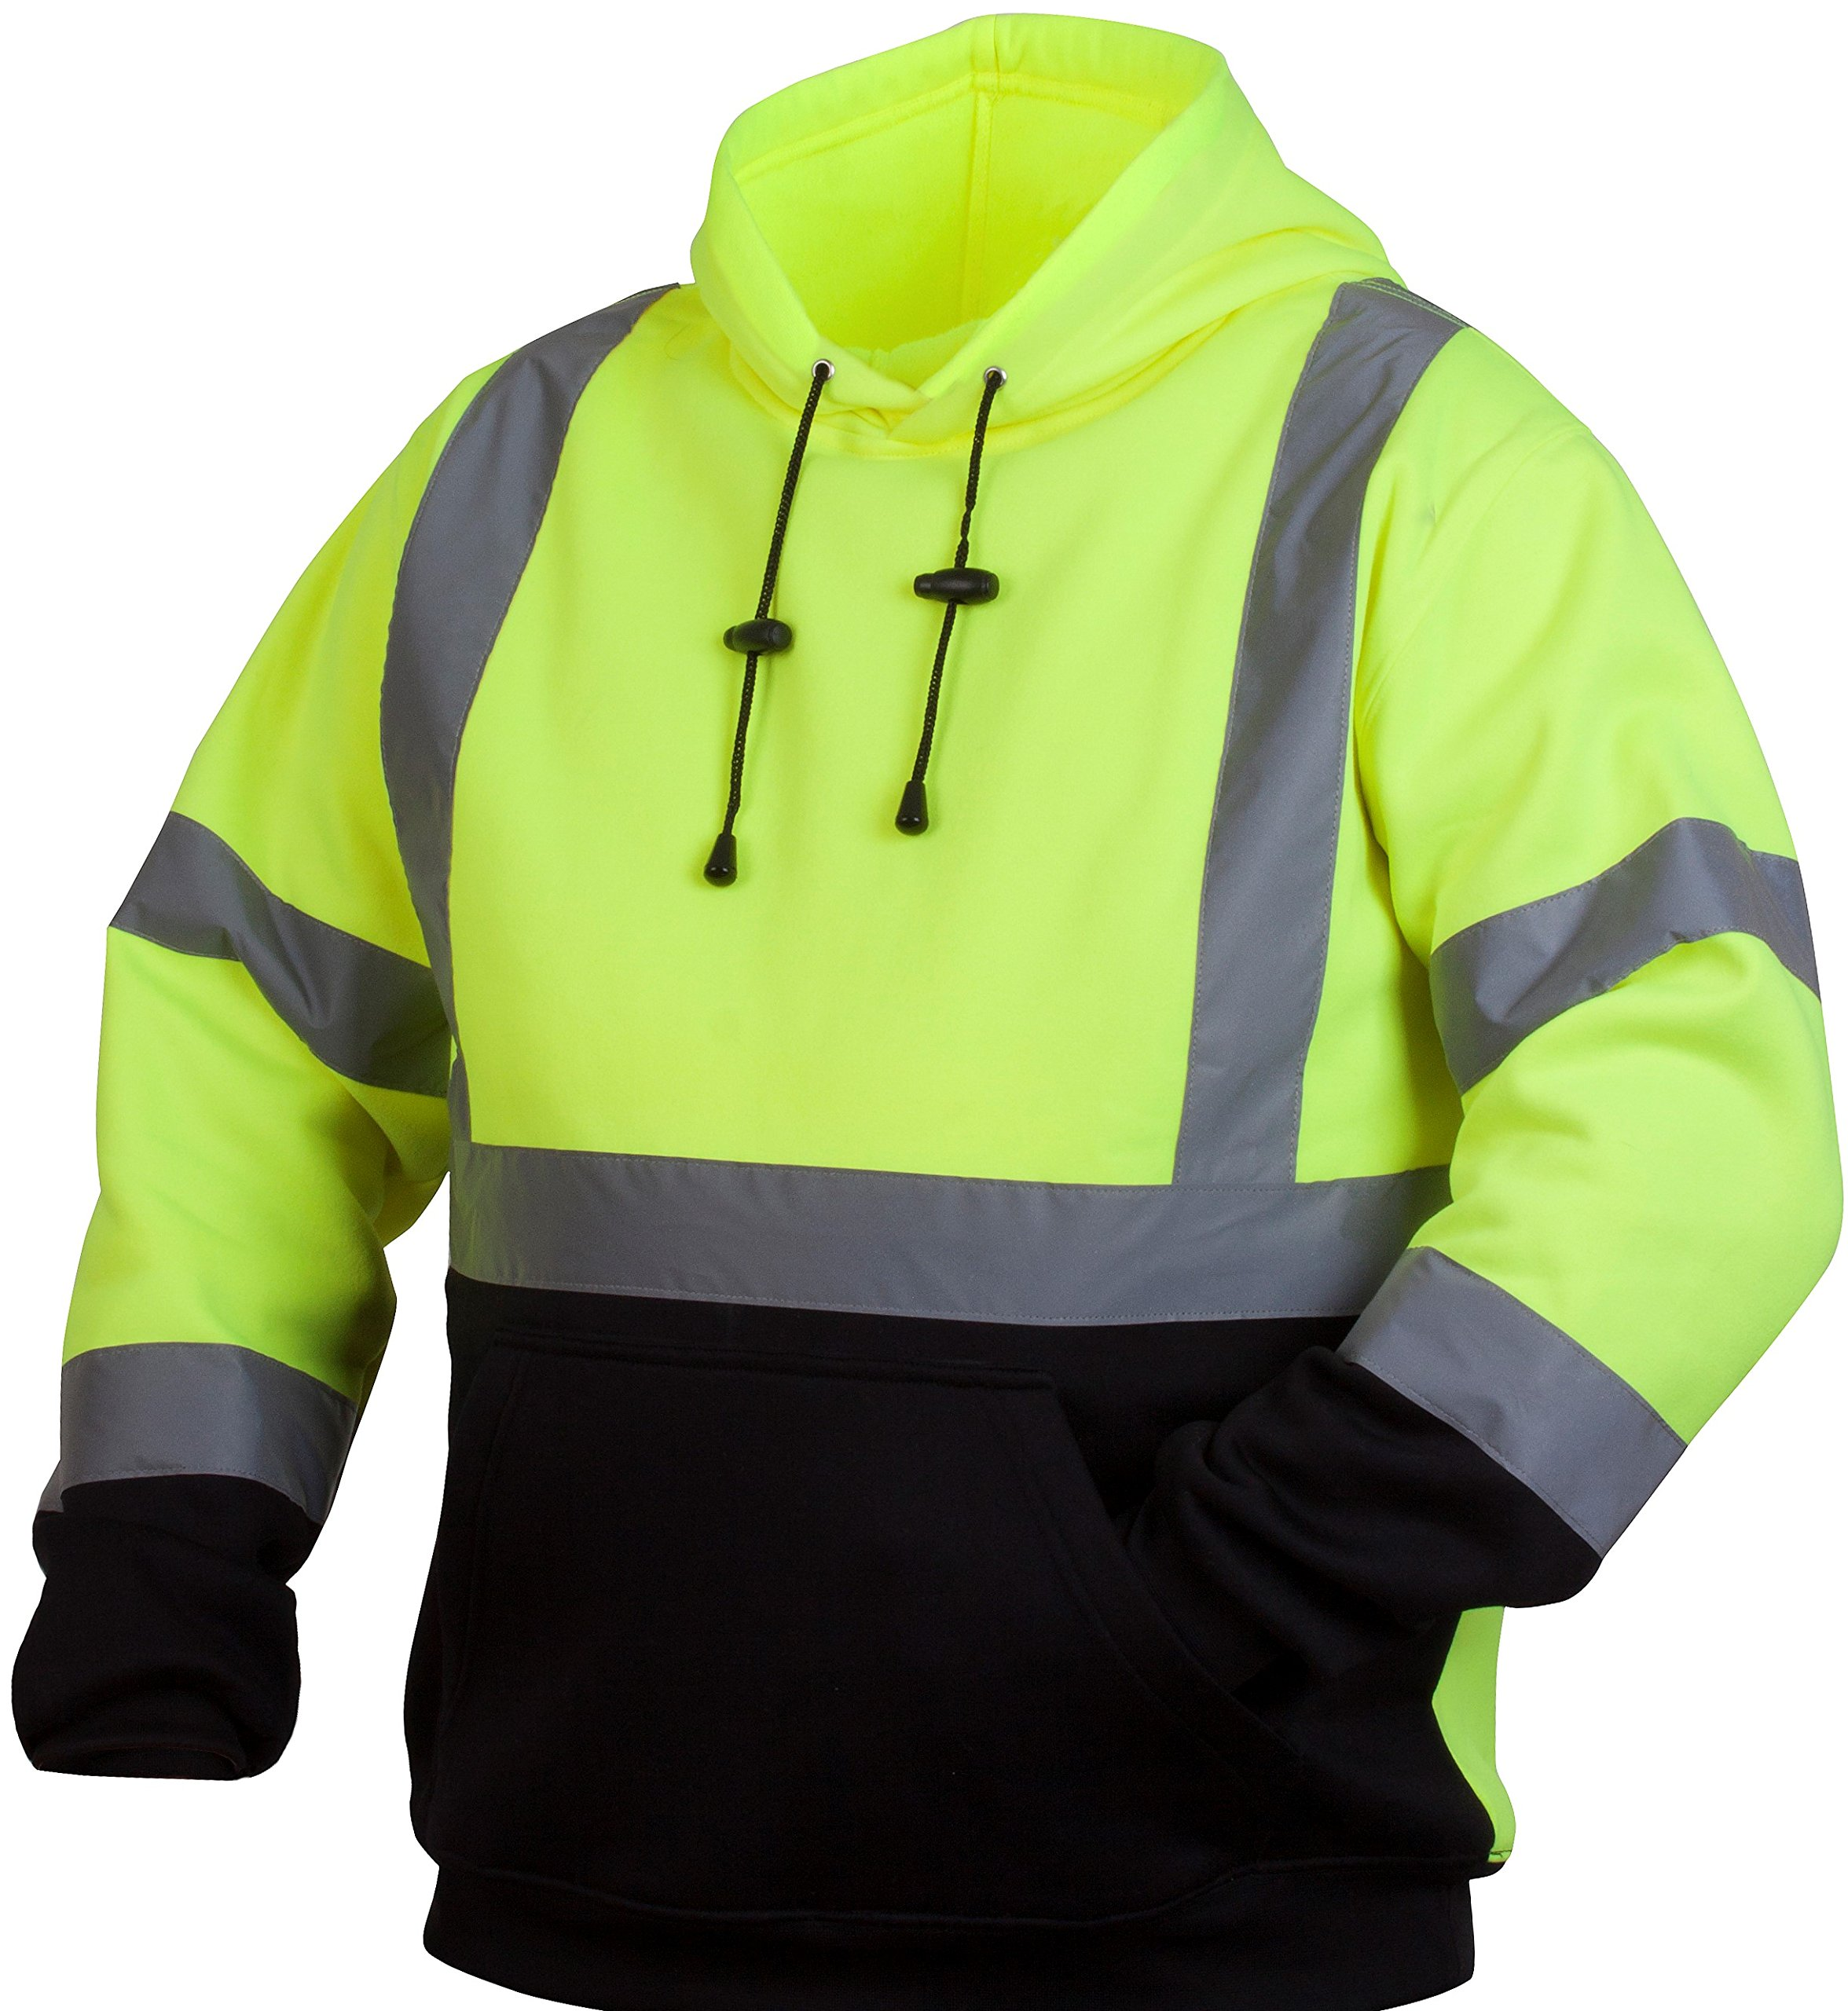 Pyramex RSSH3210L Hi-Vis Lime Safety Pullover Sweatshirt with Black Bottom, Large, Green